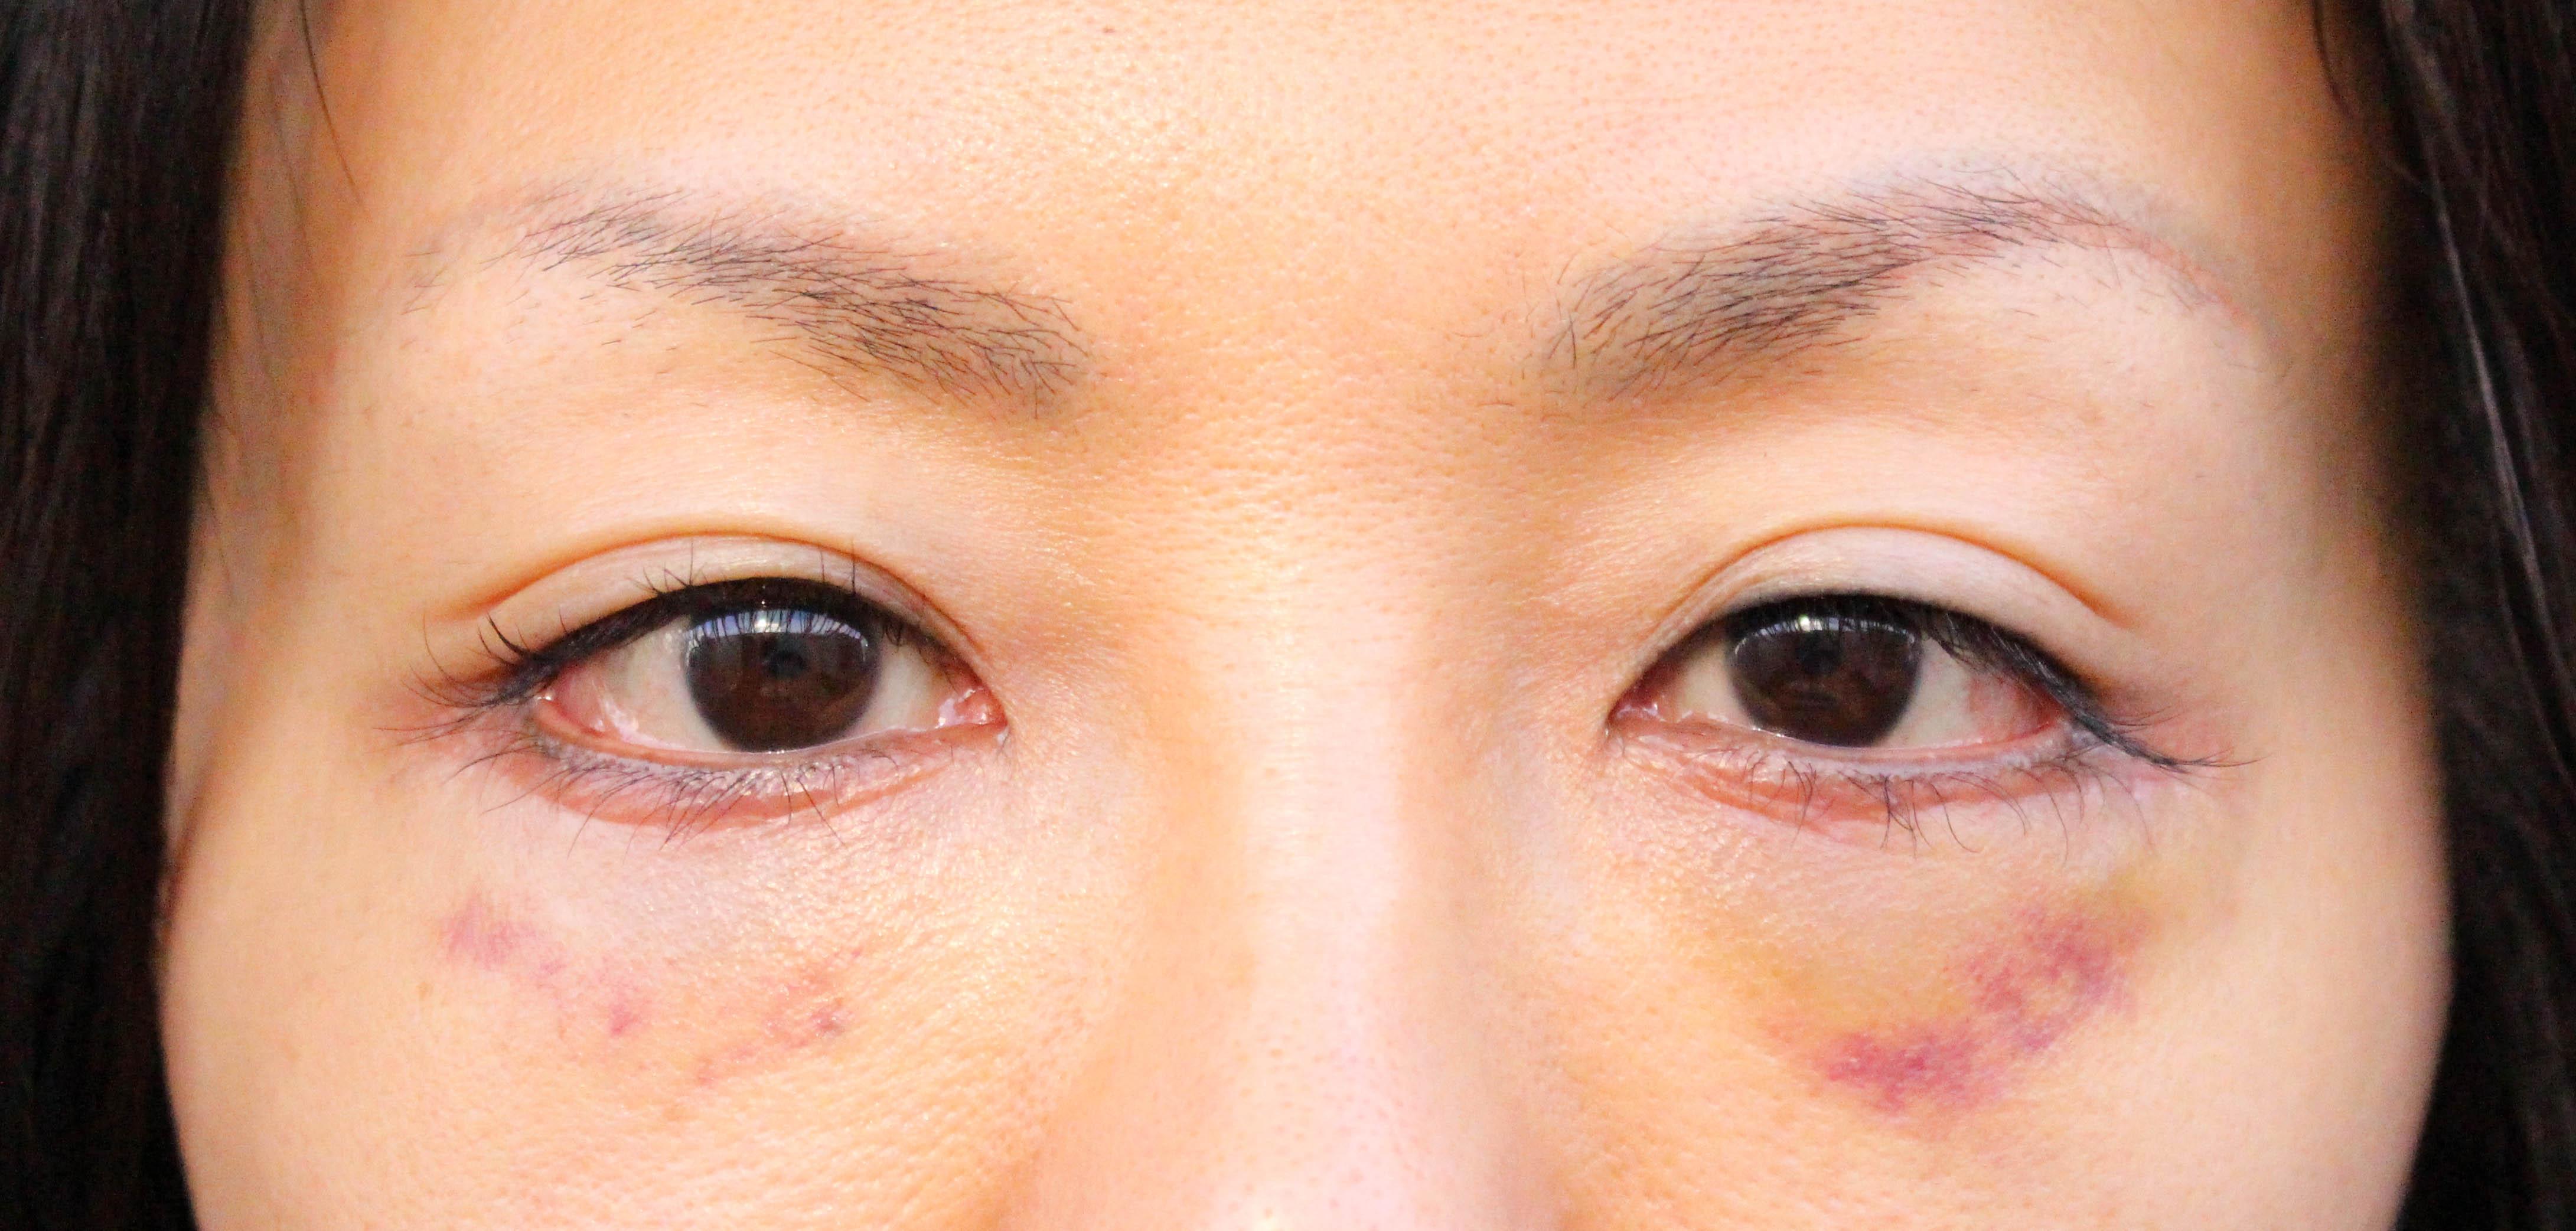 hamura17-1 - image